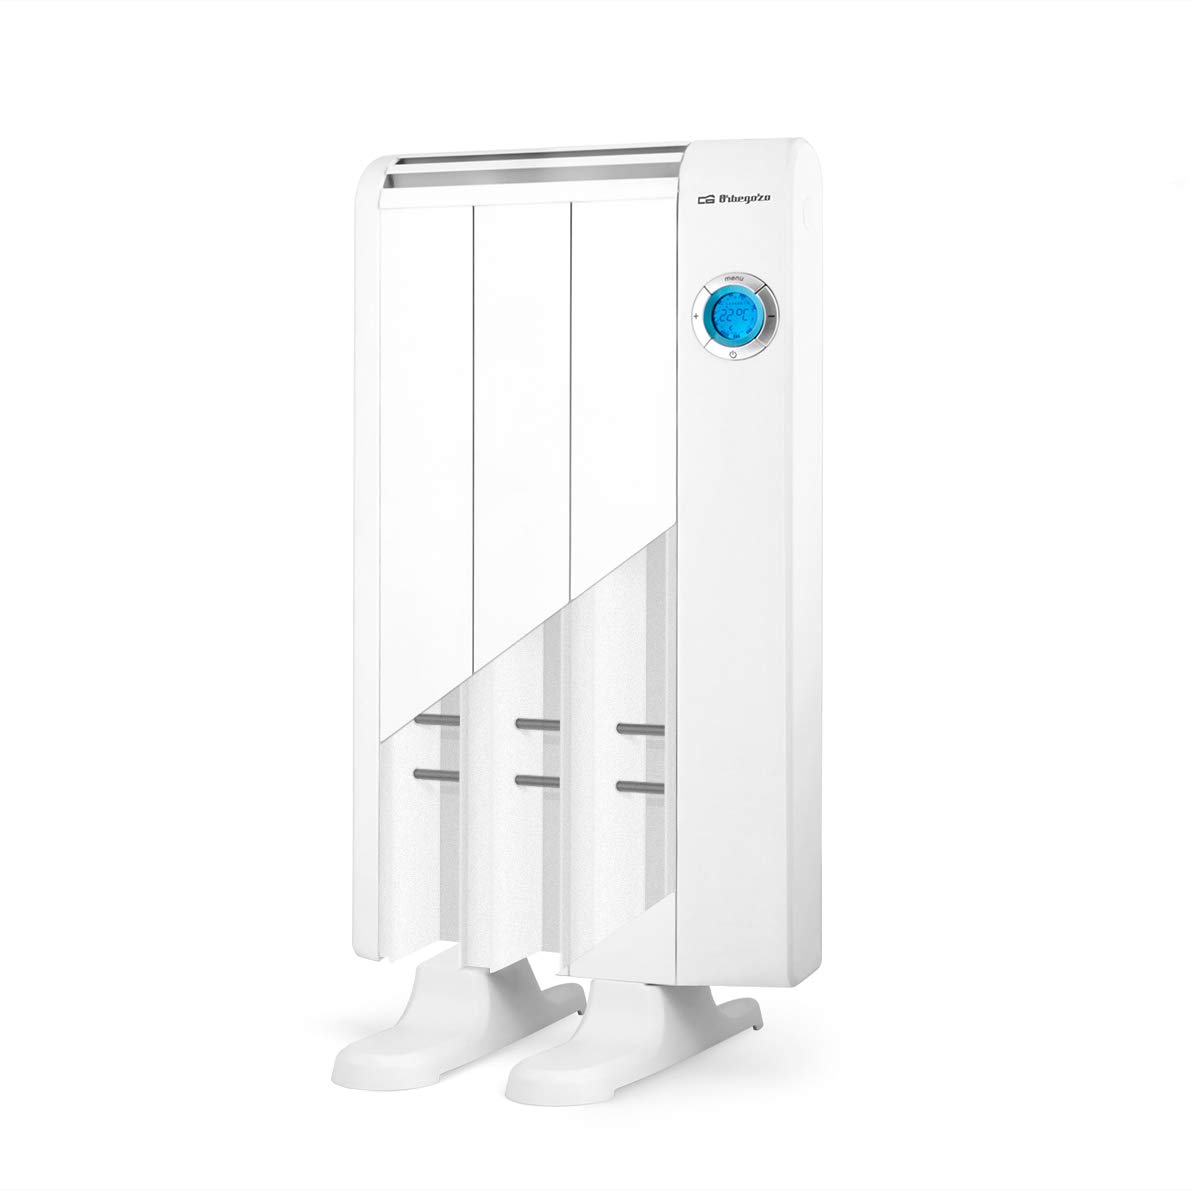 Mando a Distancia Aluminio Pantalla Digital LCD 1300 W Orbegozo Rre 1310 Emisor T/érmico Bajo Consumo 7 Elementos de Calor Blanco